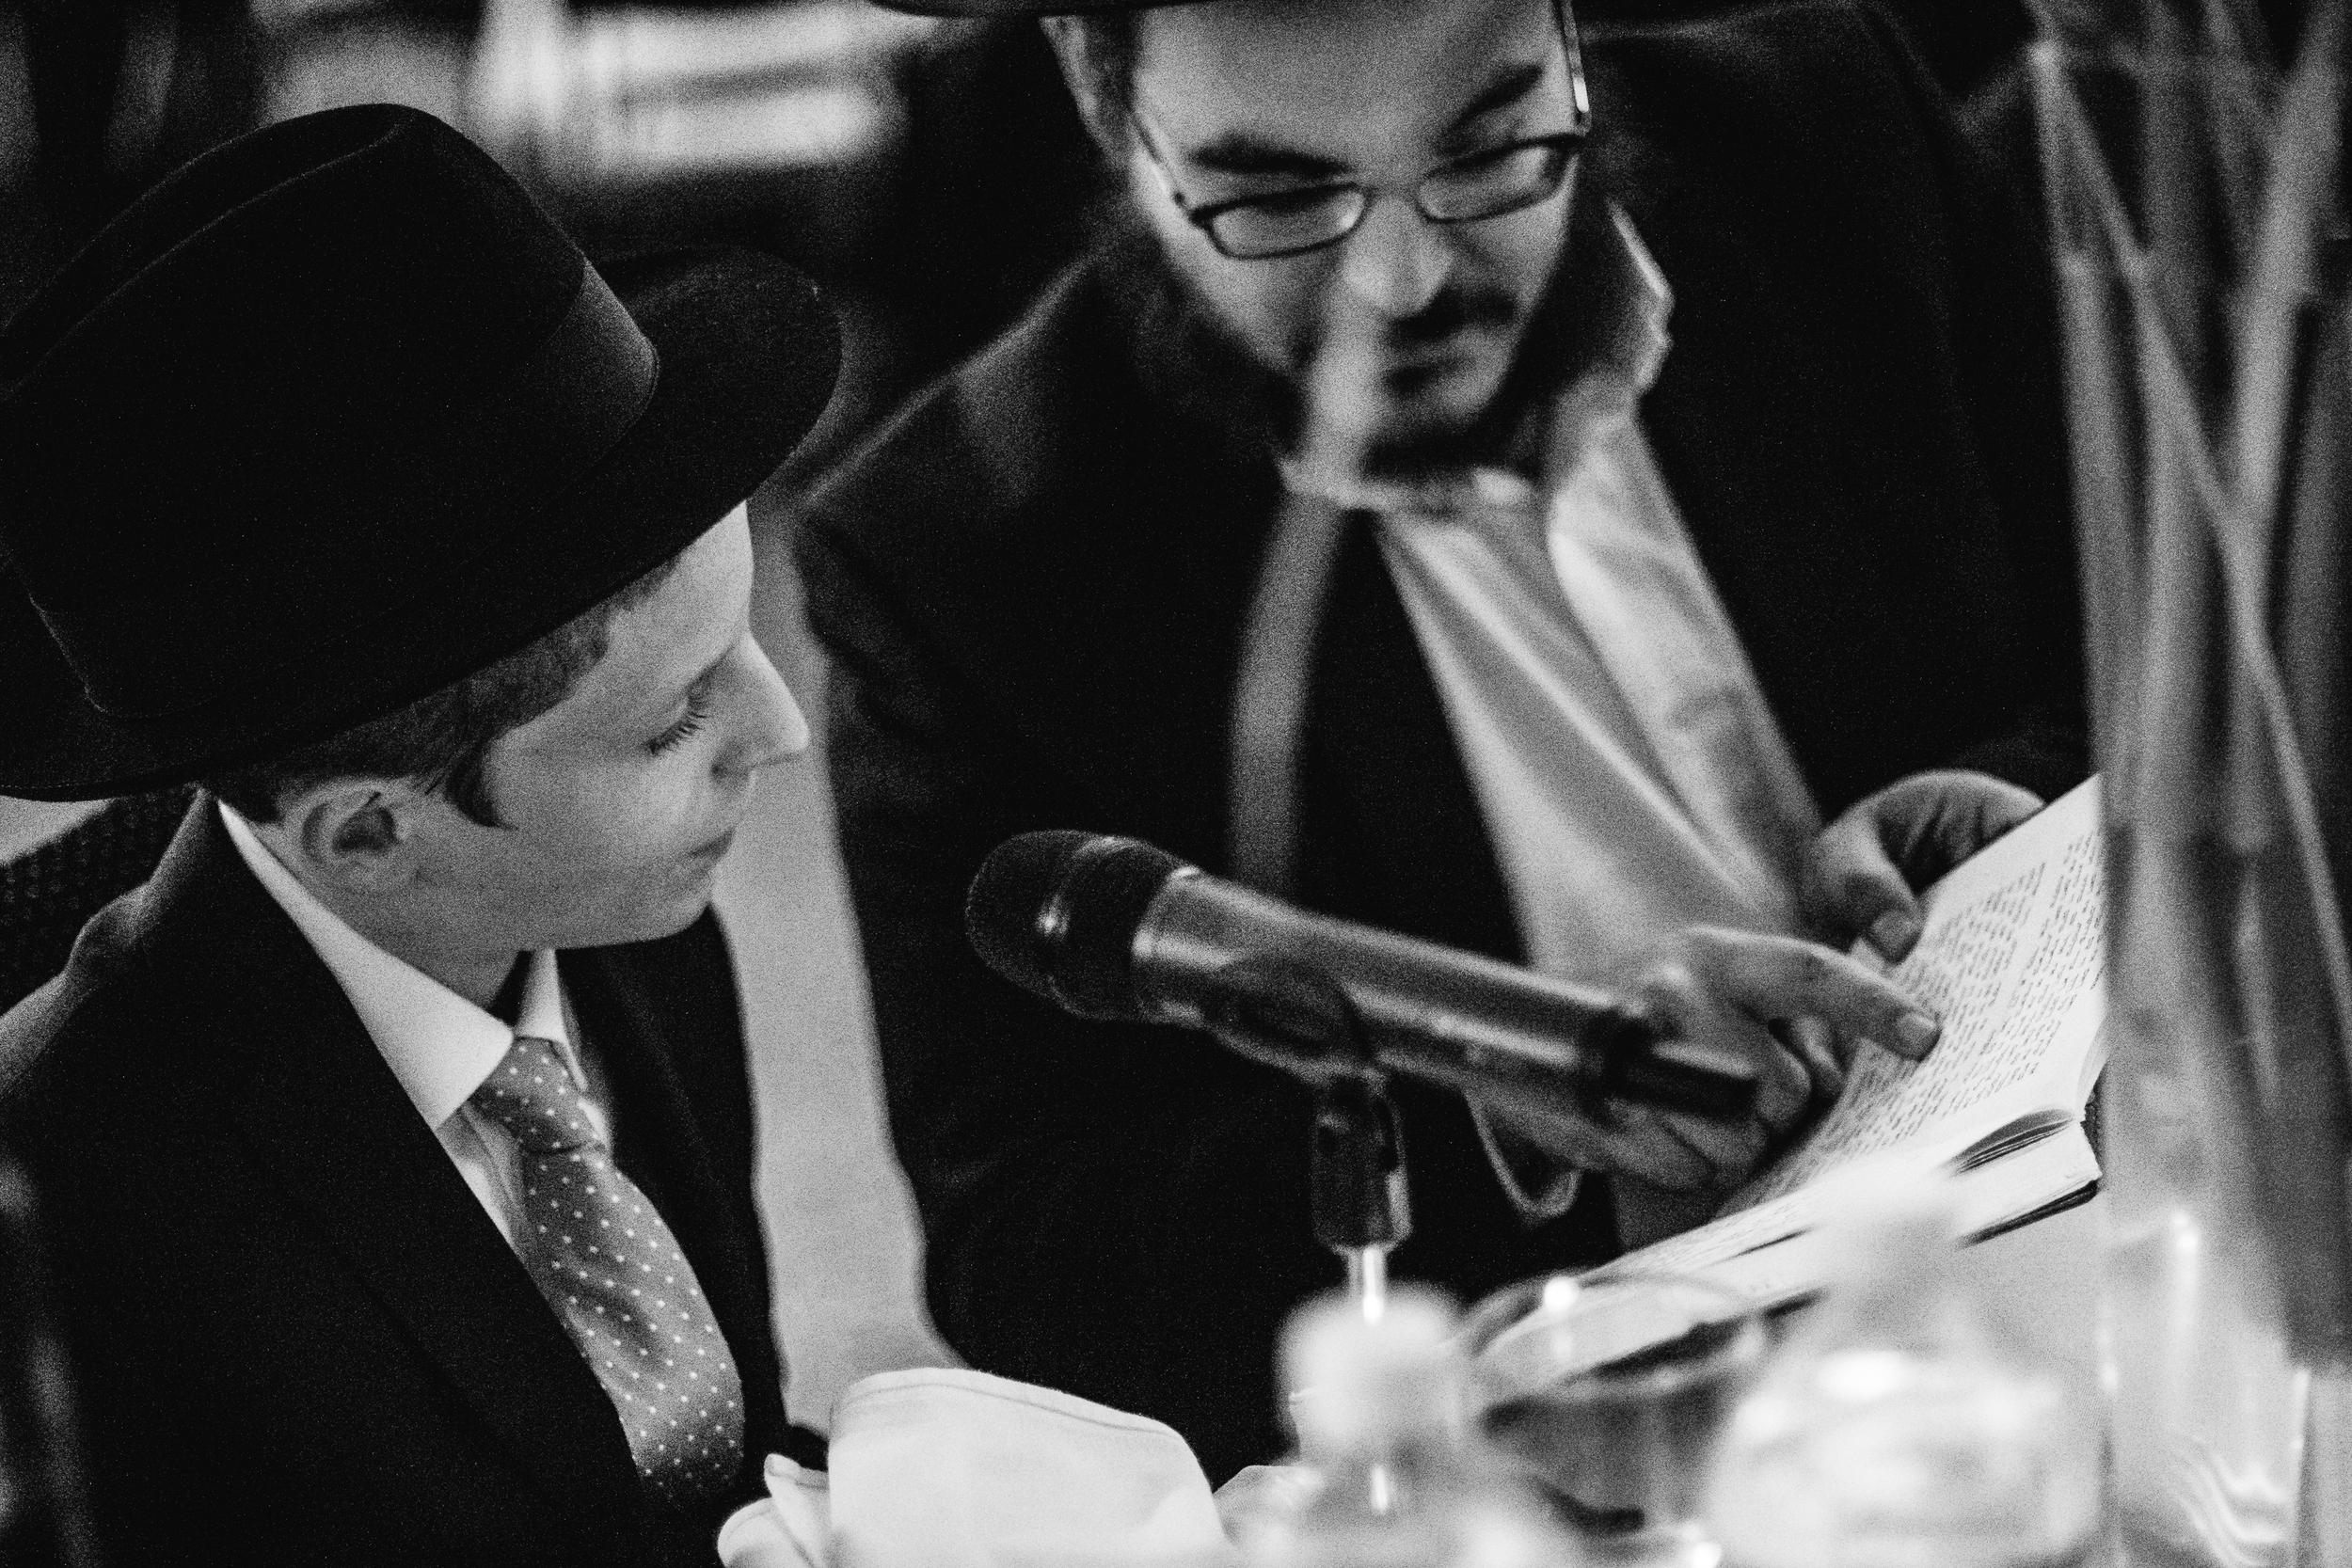 Bar Mitzvah Y. Sandman - Eliau Piha studio photography, new york, events, people-0254.jpg